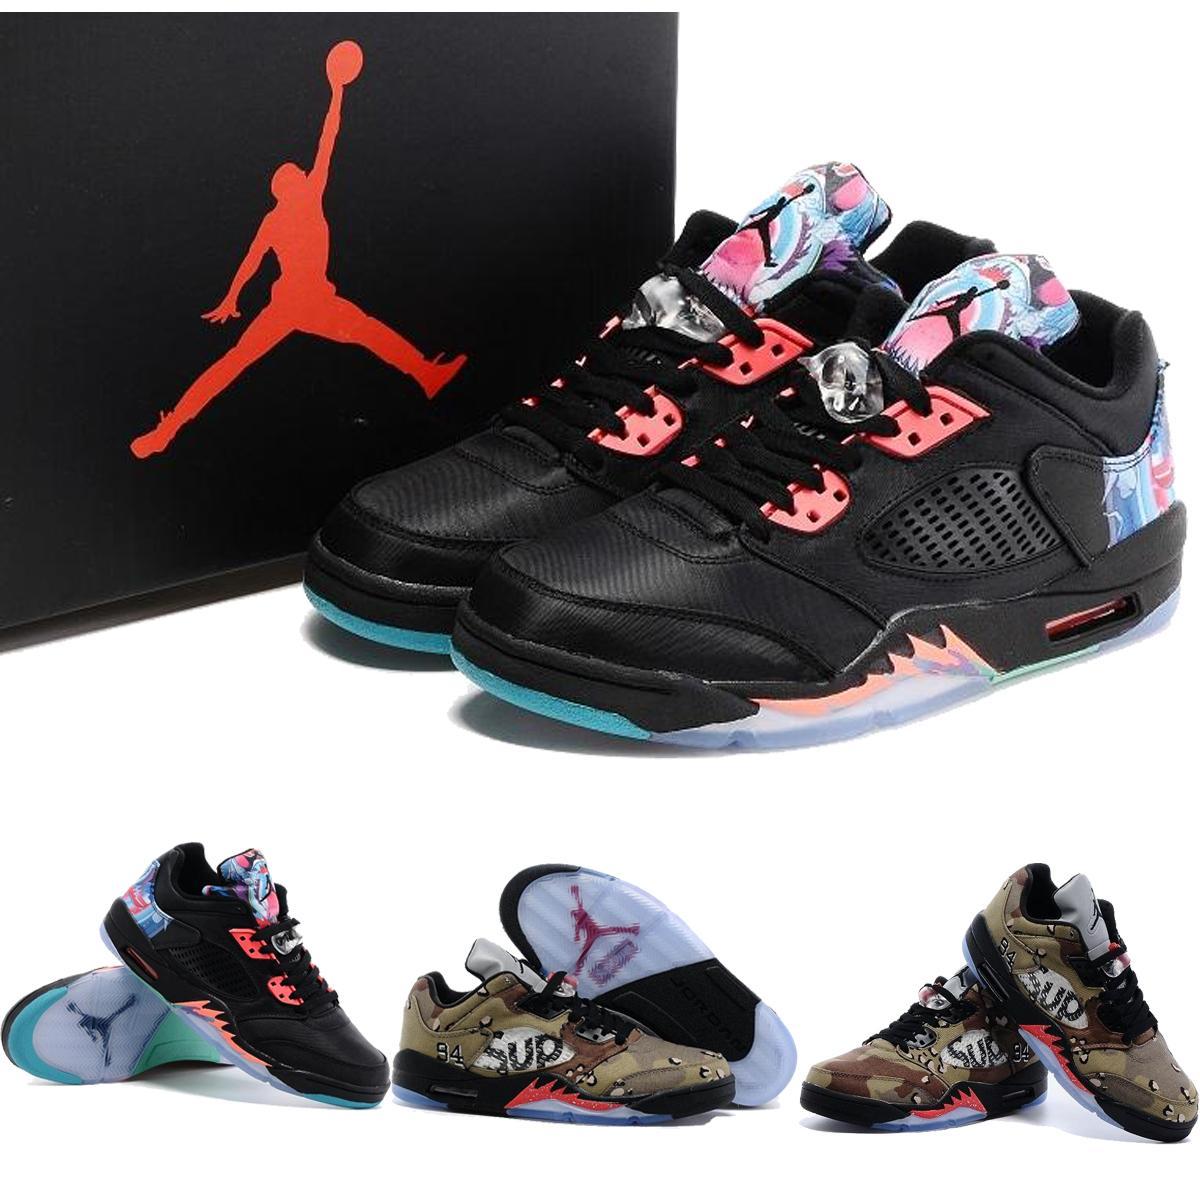 pretty nice 395ac 81eaf Großhandel Nike Air Jordan 5 Retro V China Supreme Low Herren Basketball  Schuhe, Großhandel Günstige AJ5 Retro 5 V Für Männer Low Schuh Turnschuhe  J5S Größe ...